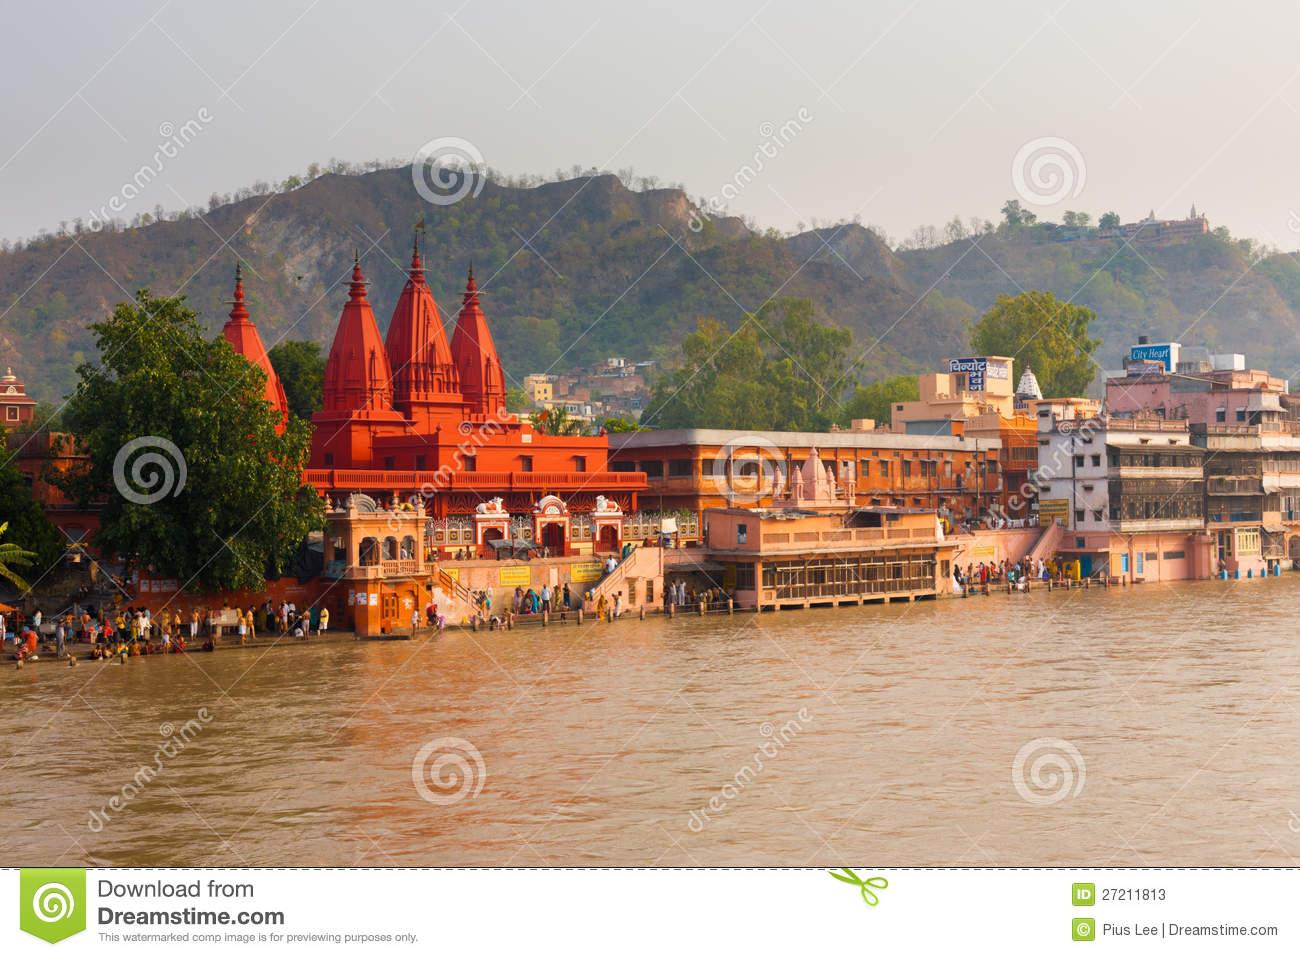 Ganga river clipart royalty free stock Ganga river clipart - ClipartFest royalty free stock